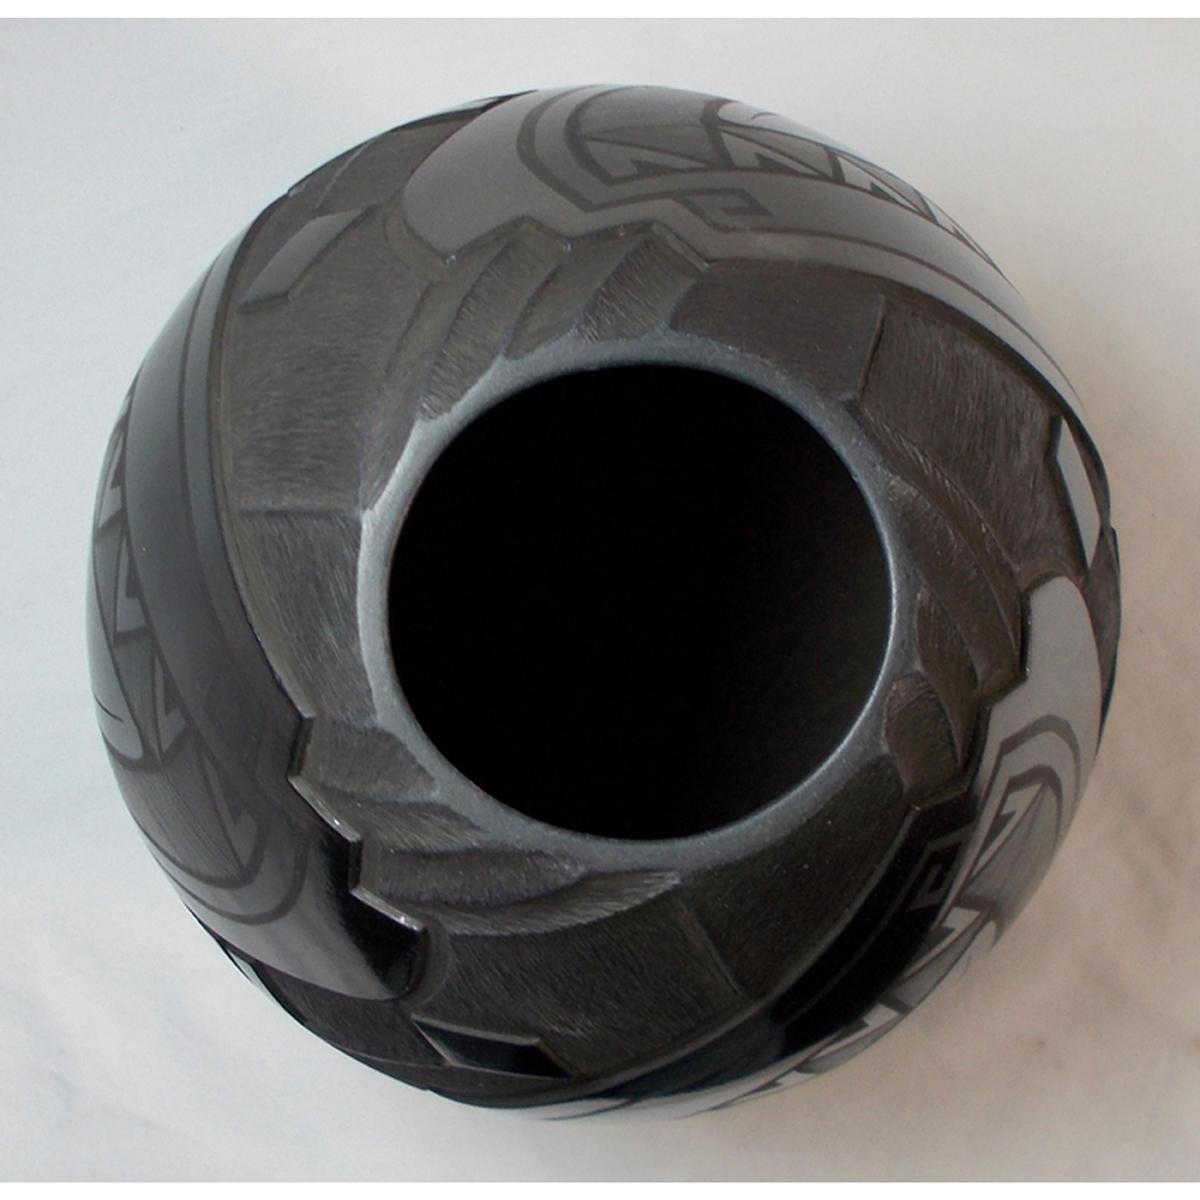 Mata Ortiz Pottery, Chihuahua Salvador Baca & Virginia Lazoya Mata Ortiz Pottery